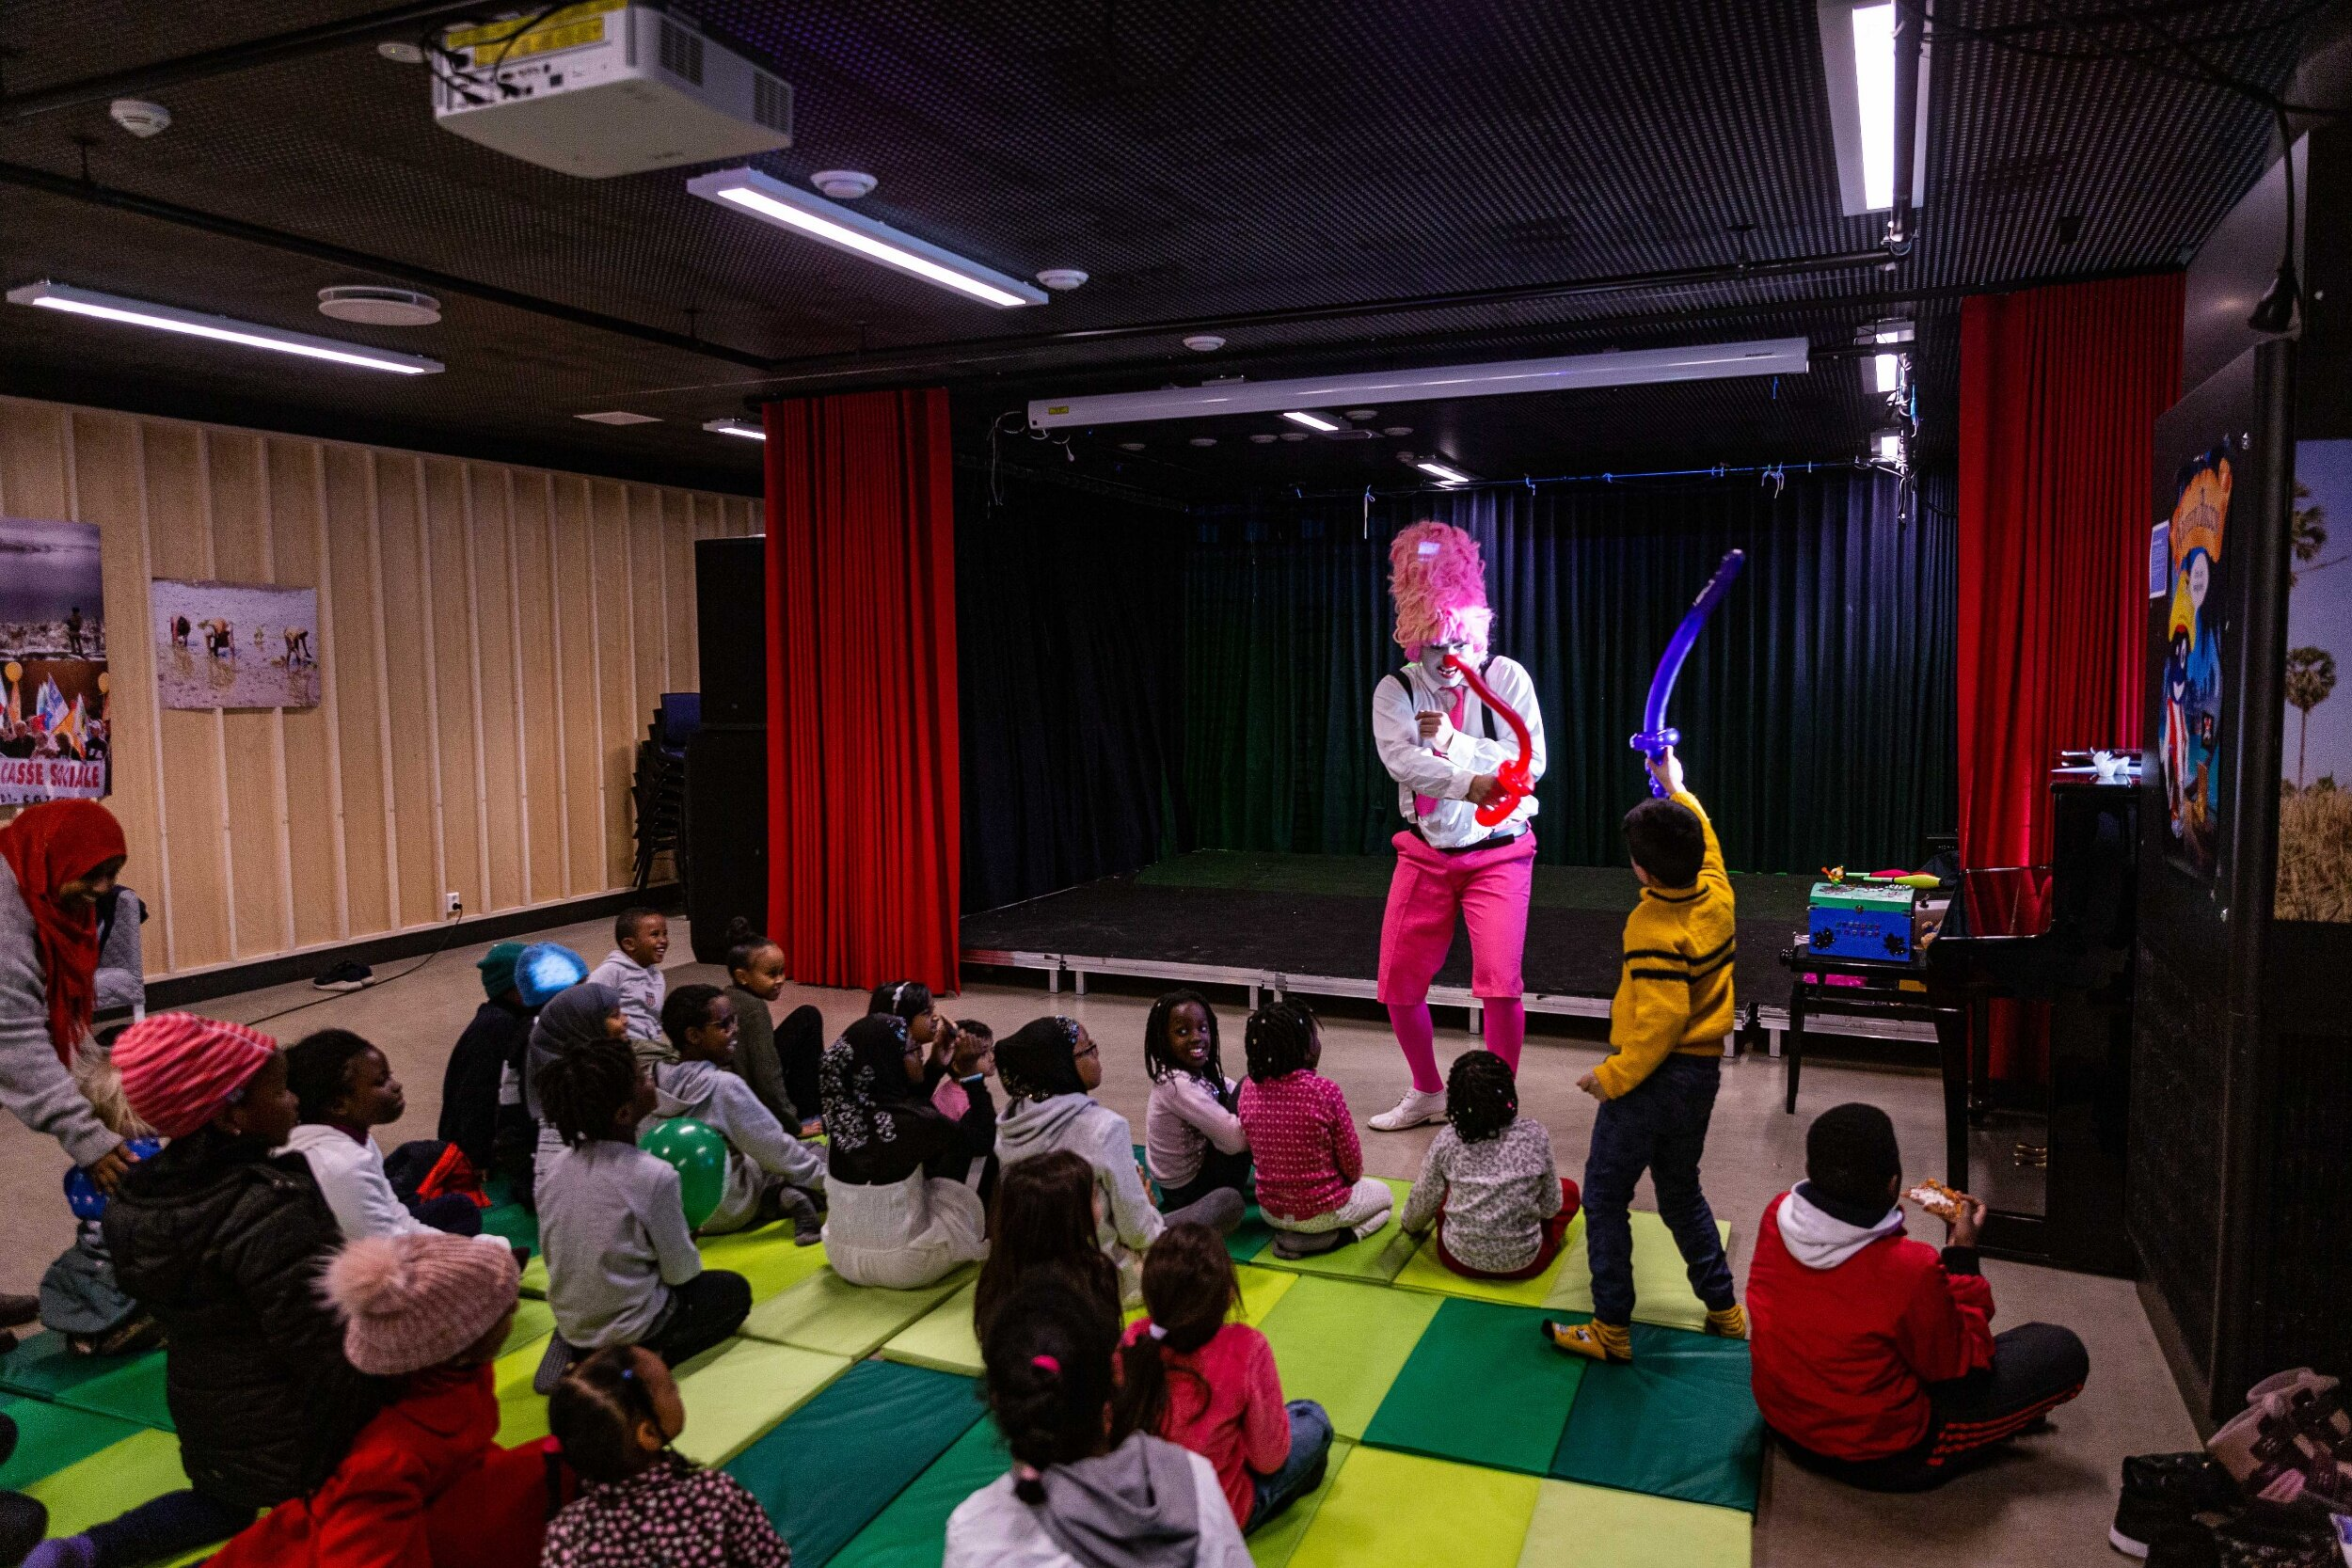 Barna var i fokus under årets første AFF-dag. Foto: Alf Andreas Grønli Simensen.